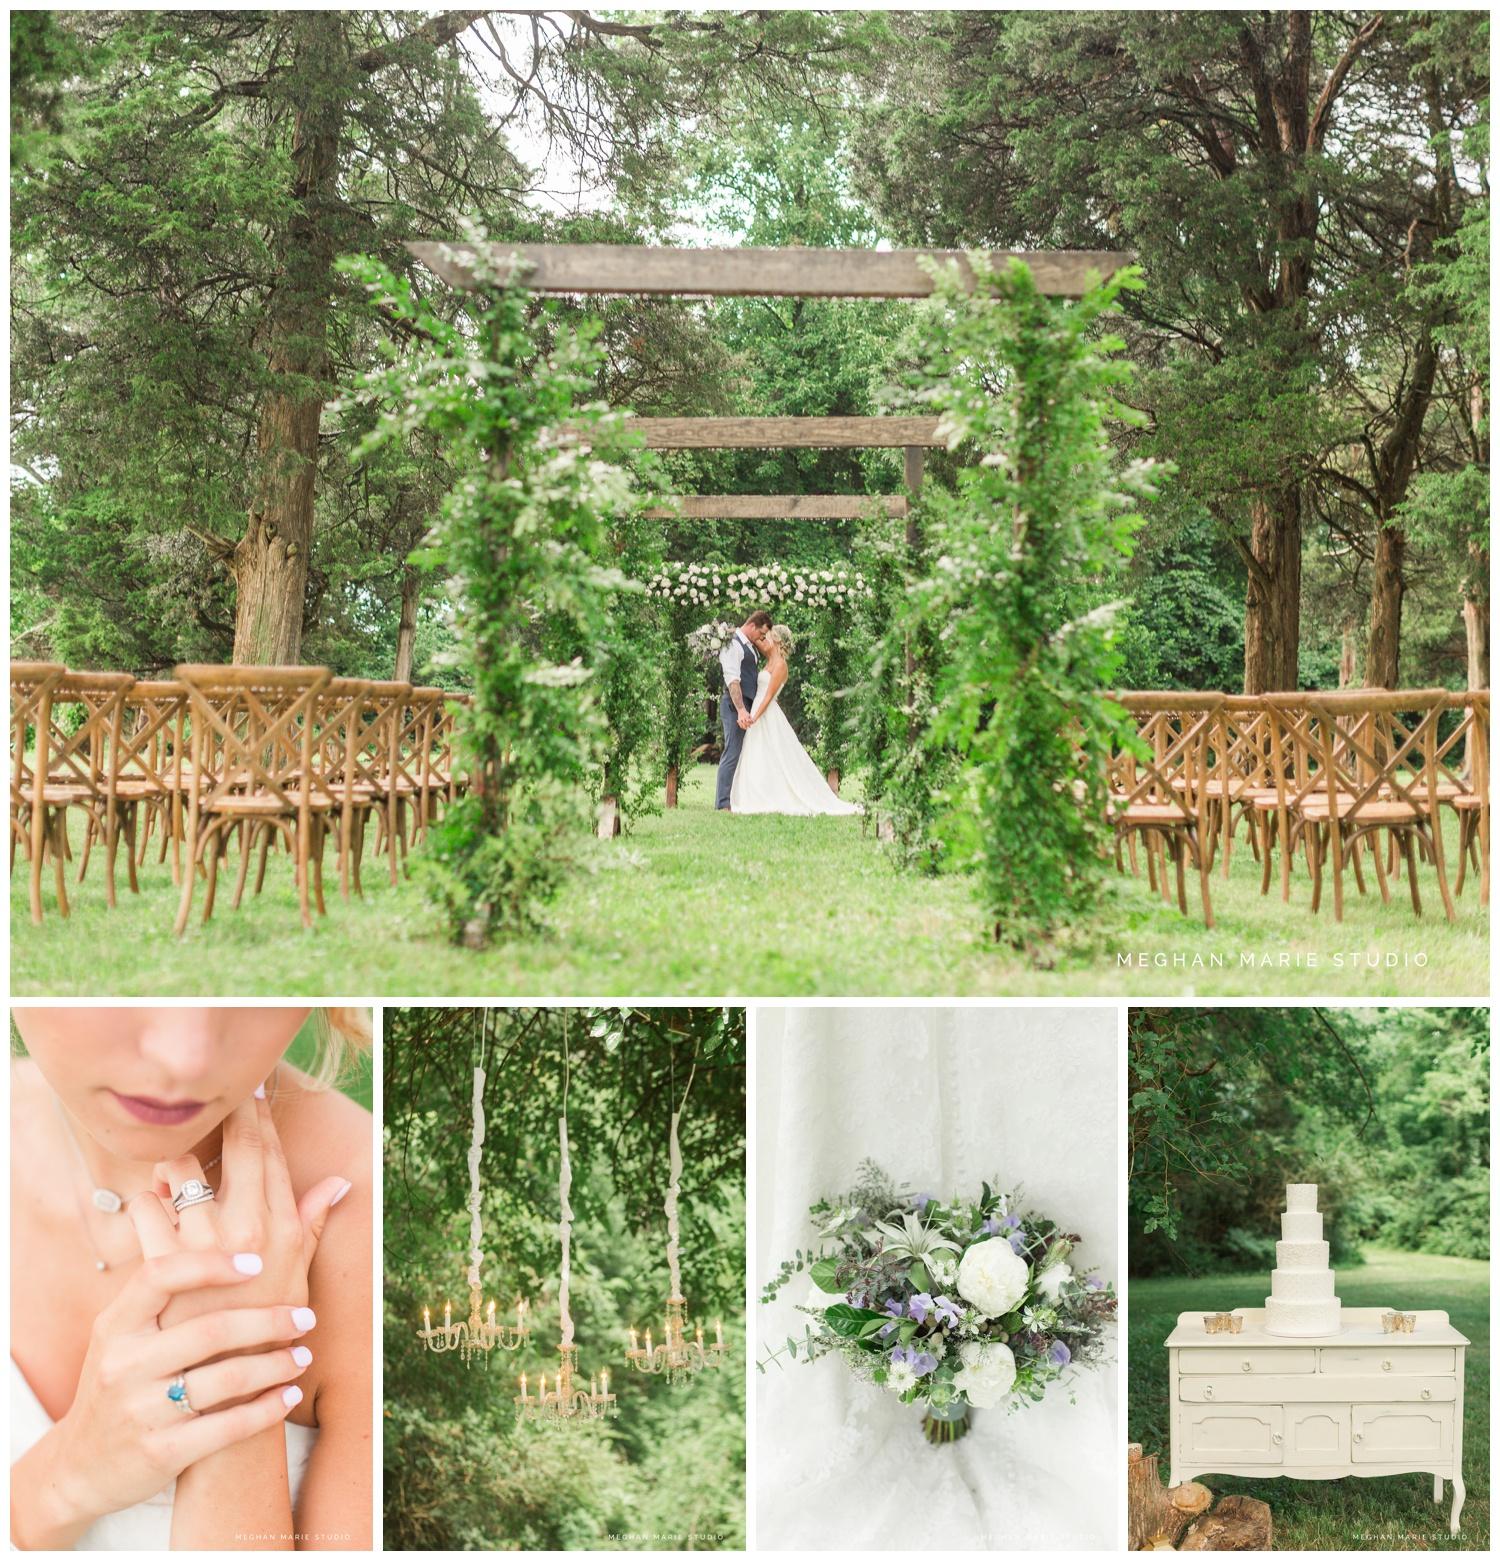 meghan marie studio wedding photographer ohio dayton cincinnati columbus outdoor rural vintage rustic DIY wedding country chic pinterest bridal gown beauty_0665.jpg